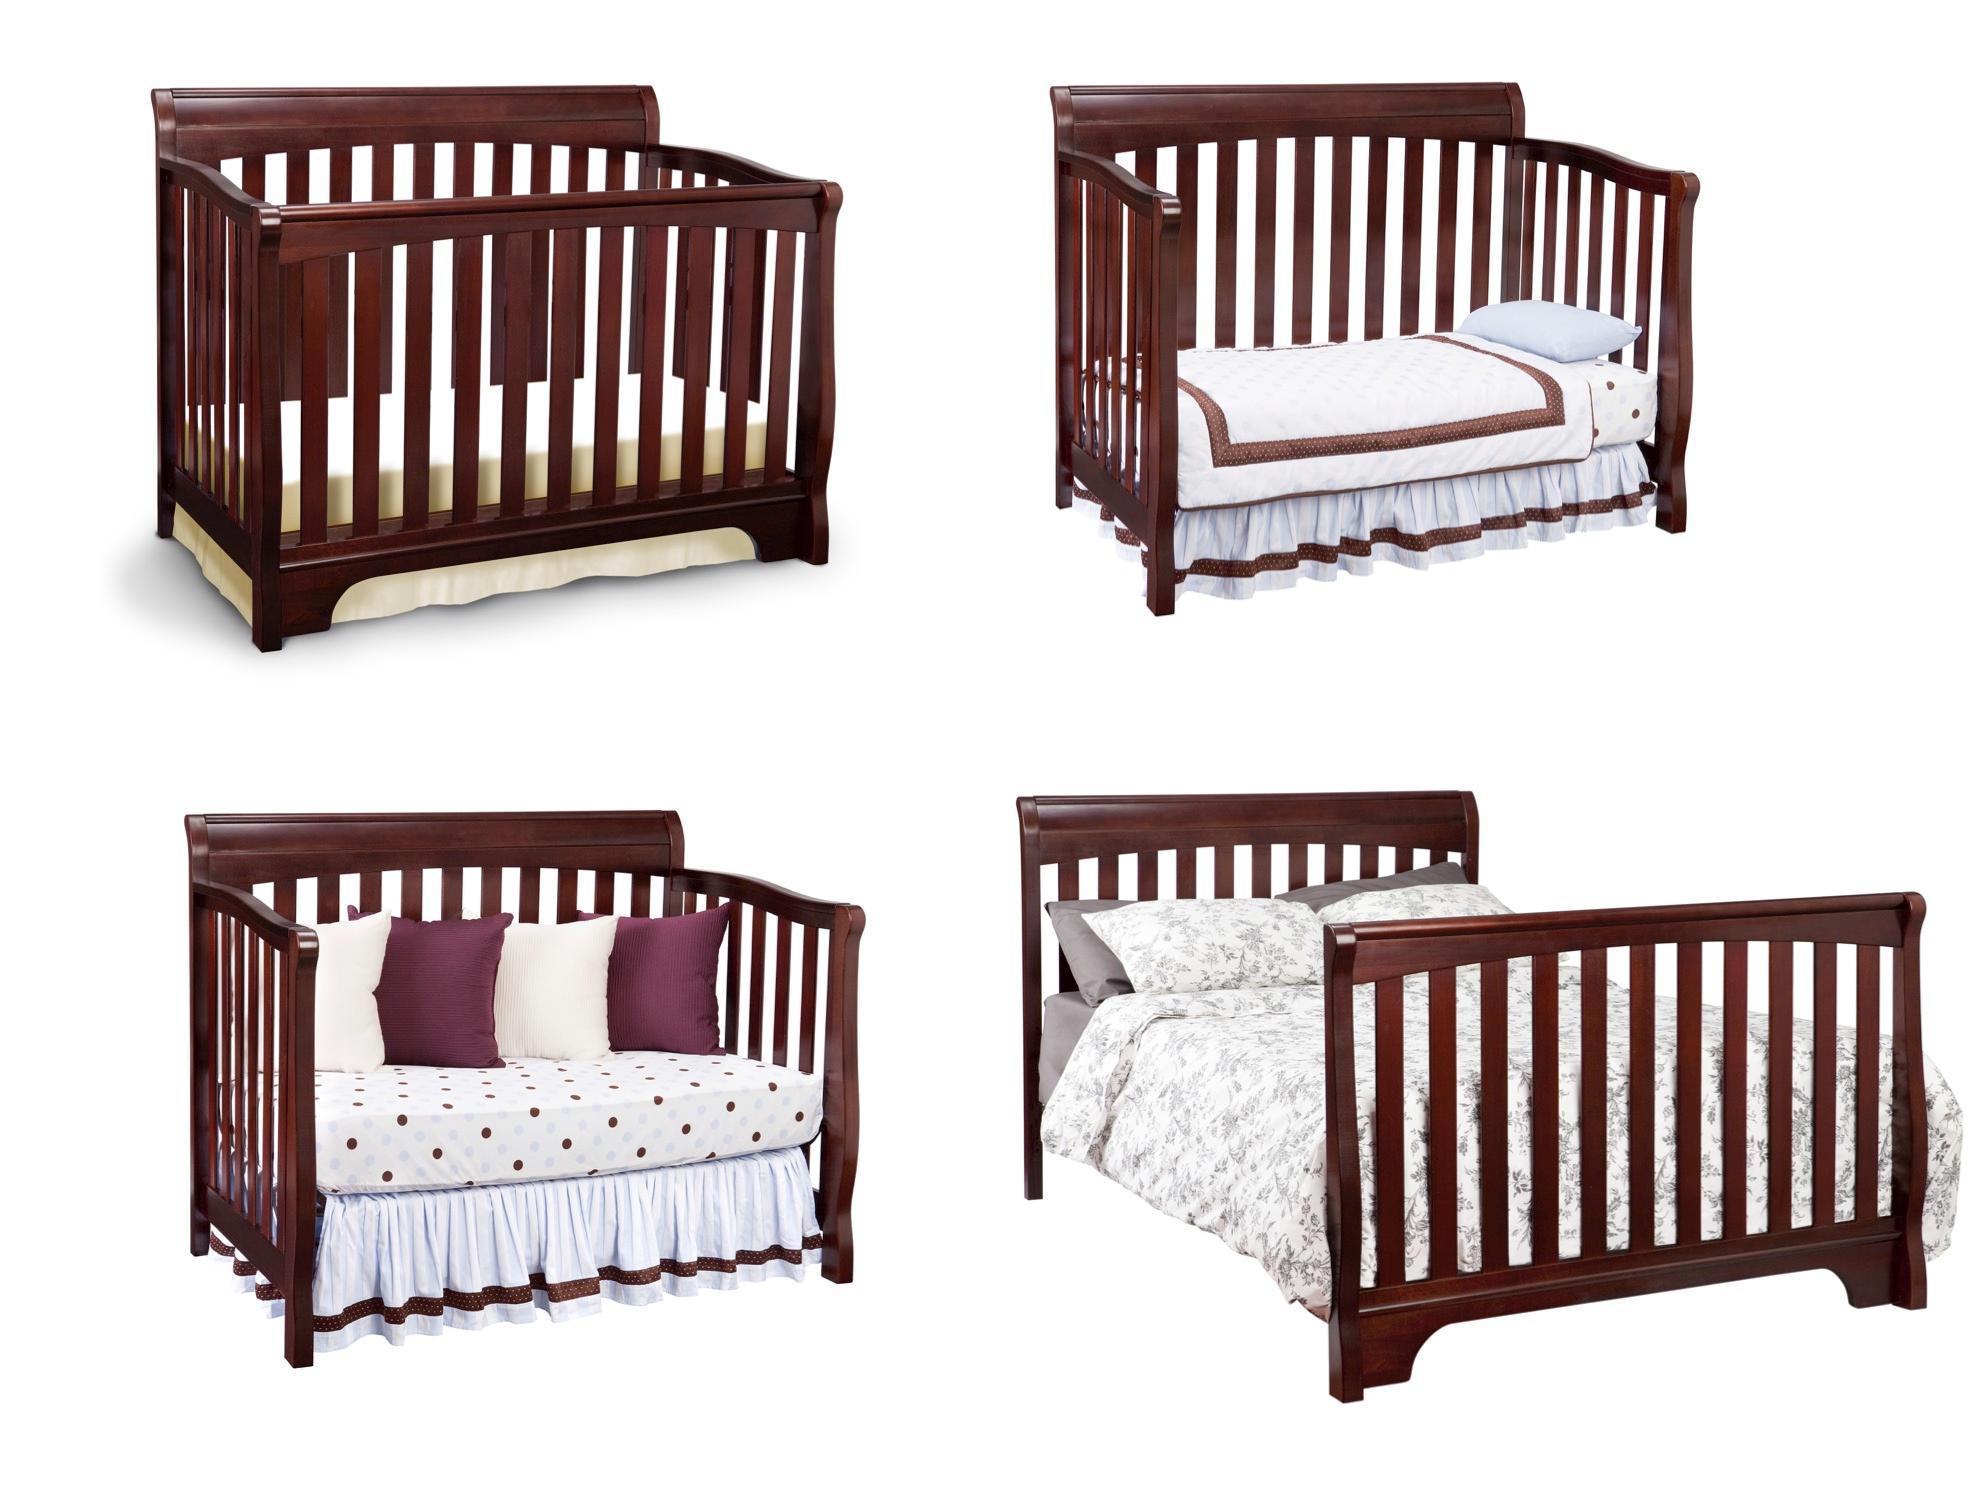 Amazon.com : Delta Children Eclipse 4-in-1 Crib, White : Baby